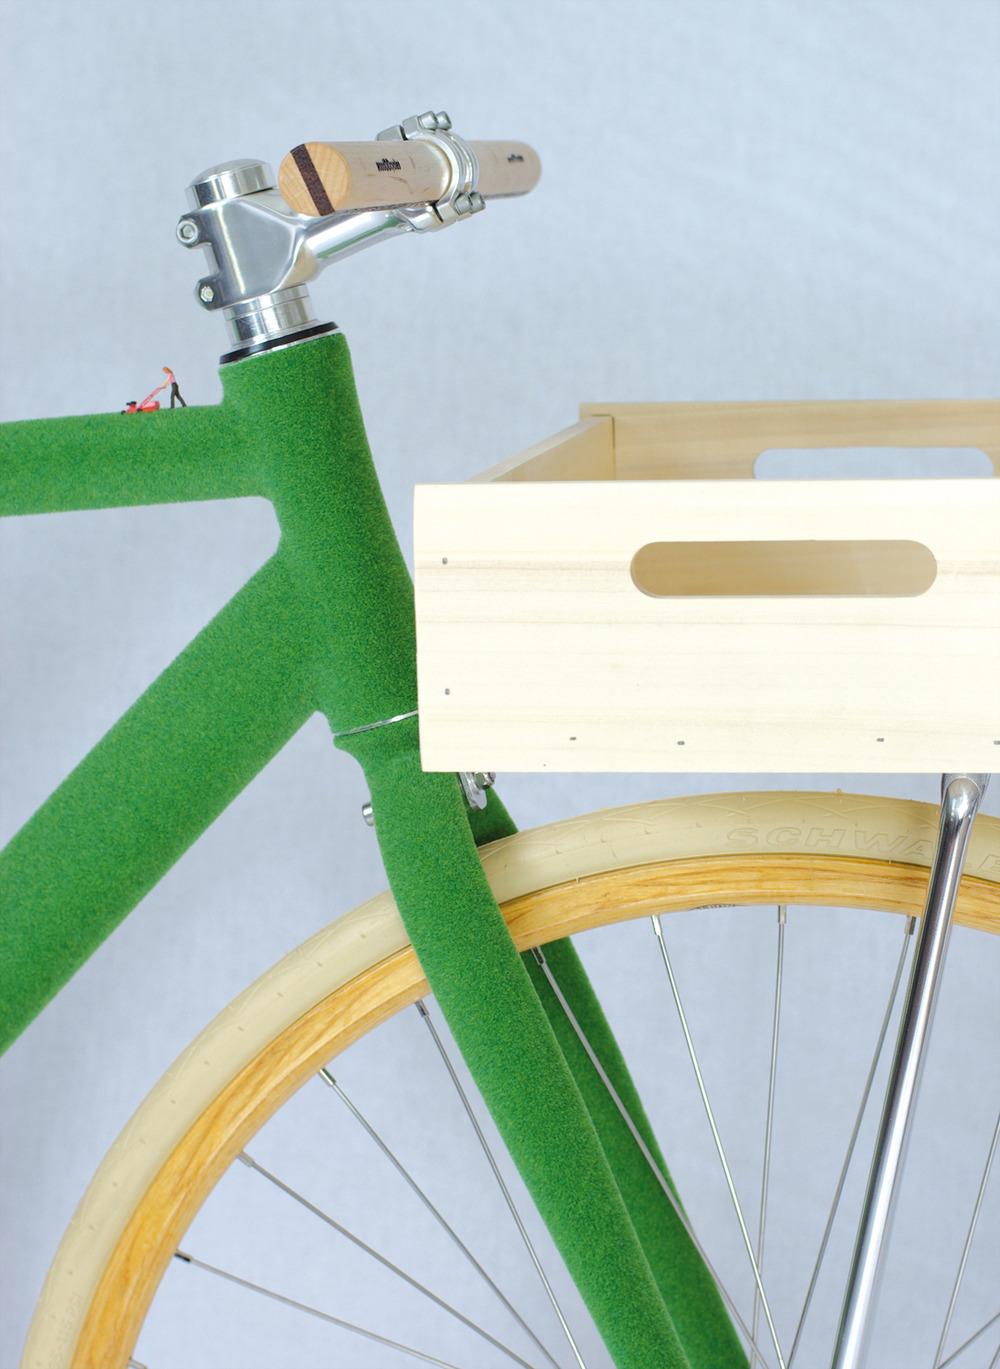 Super Green Bike by Swab Design